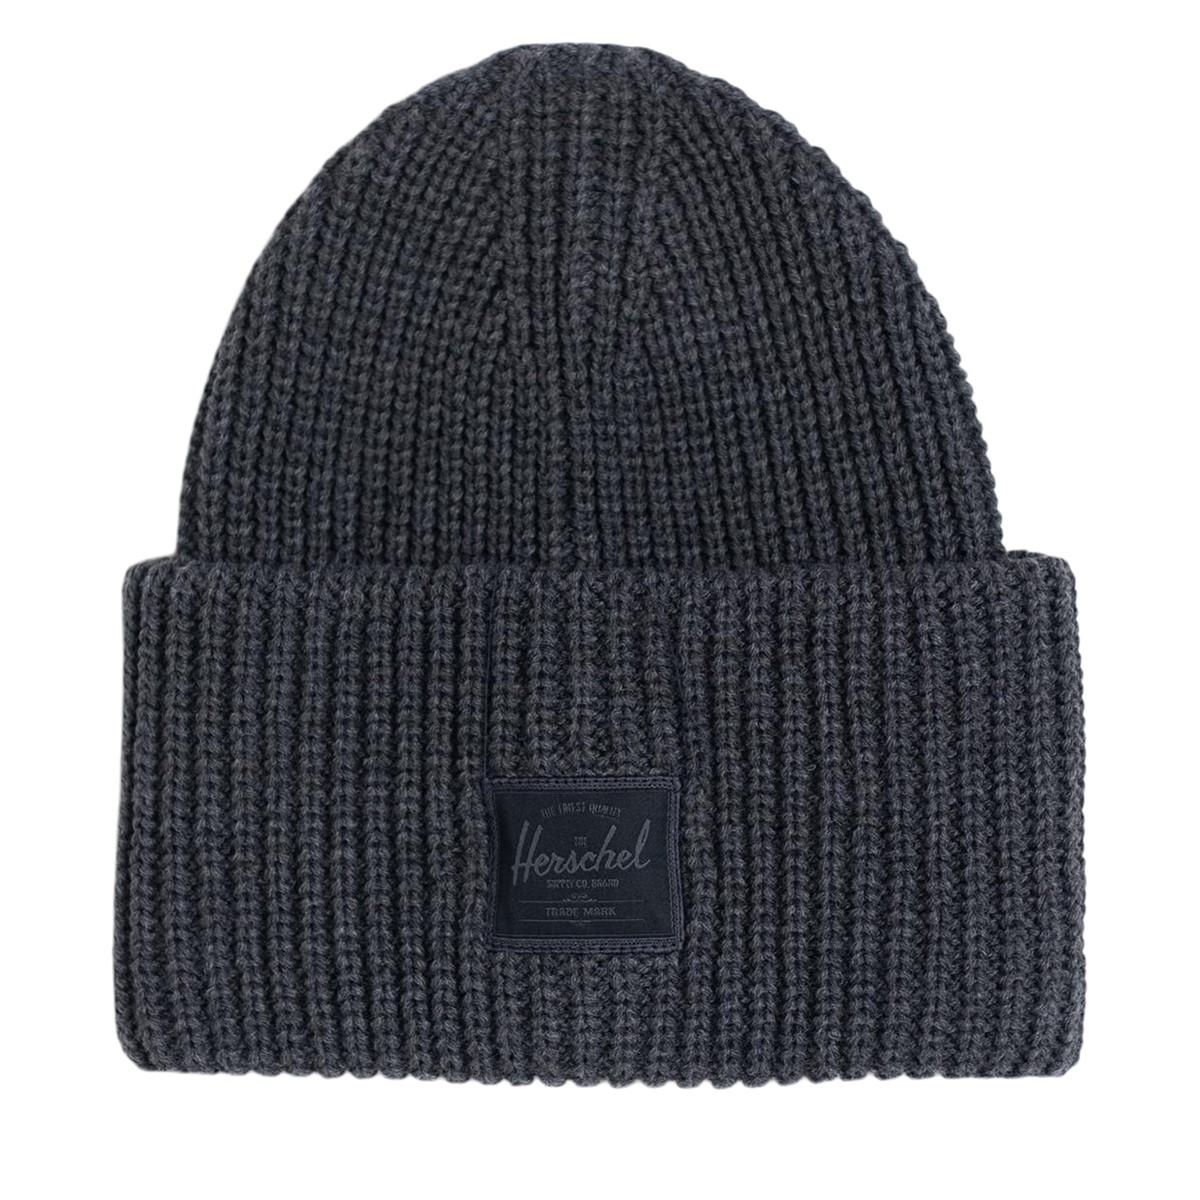 Juneau Rib Knit Beanie in Charcoal